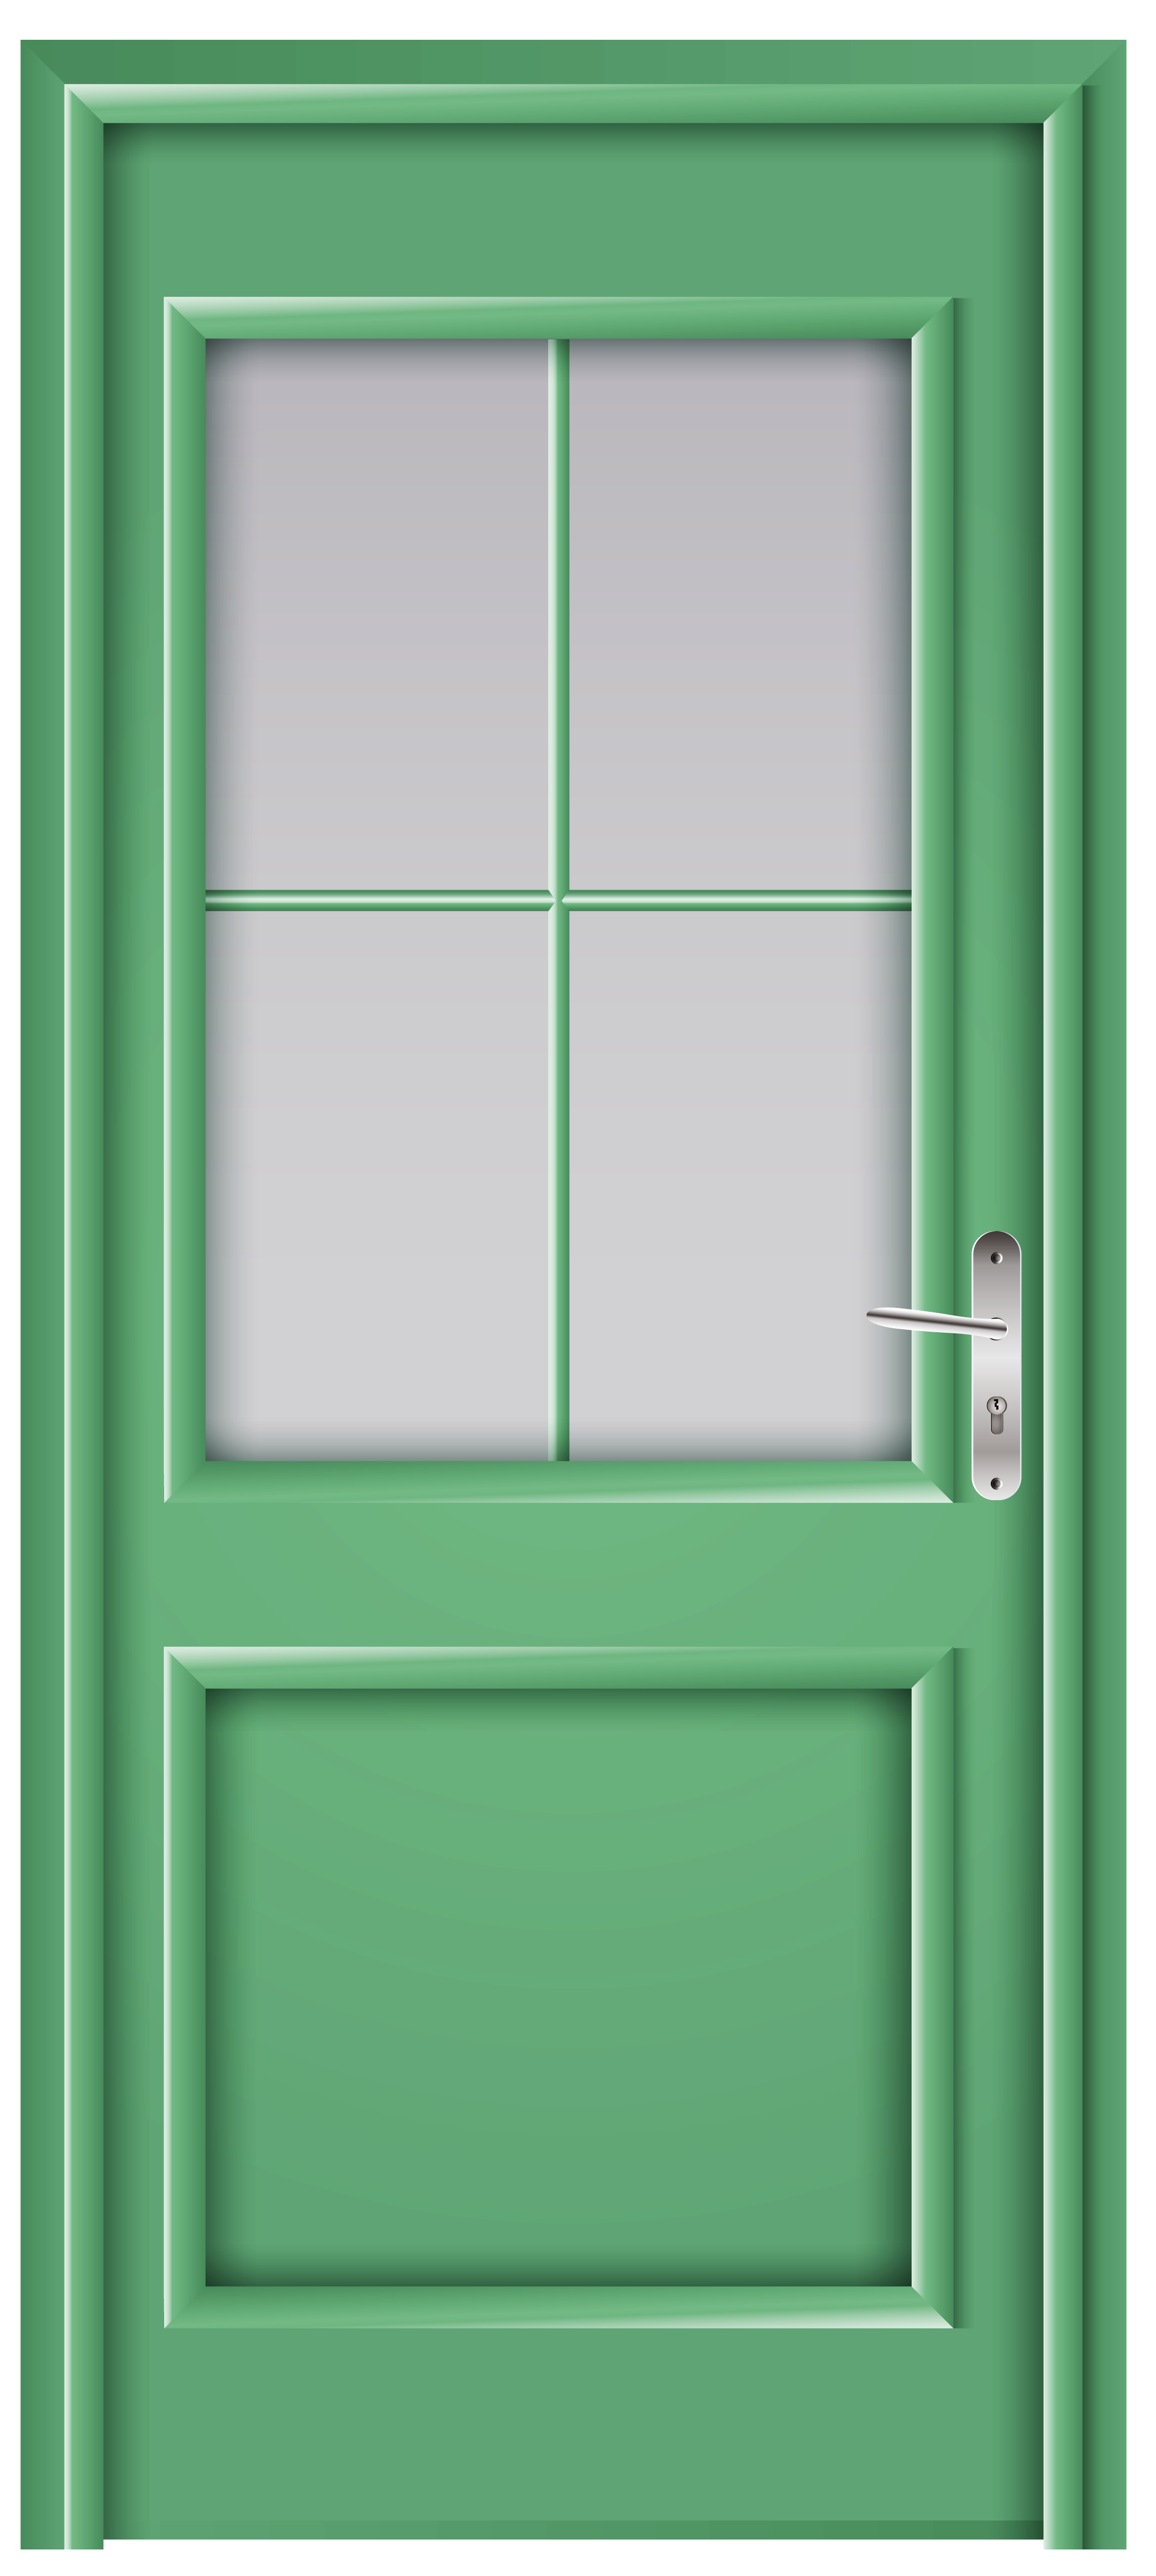 Green png clip art. Clipart door